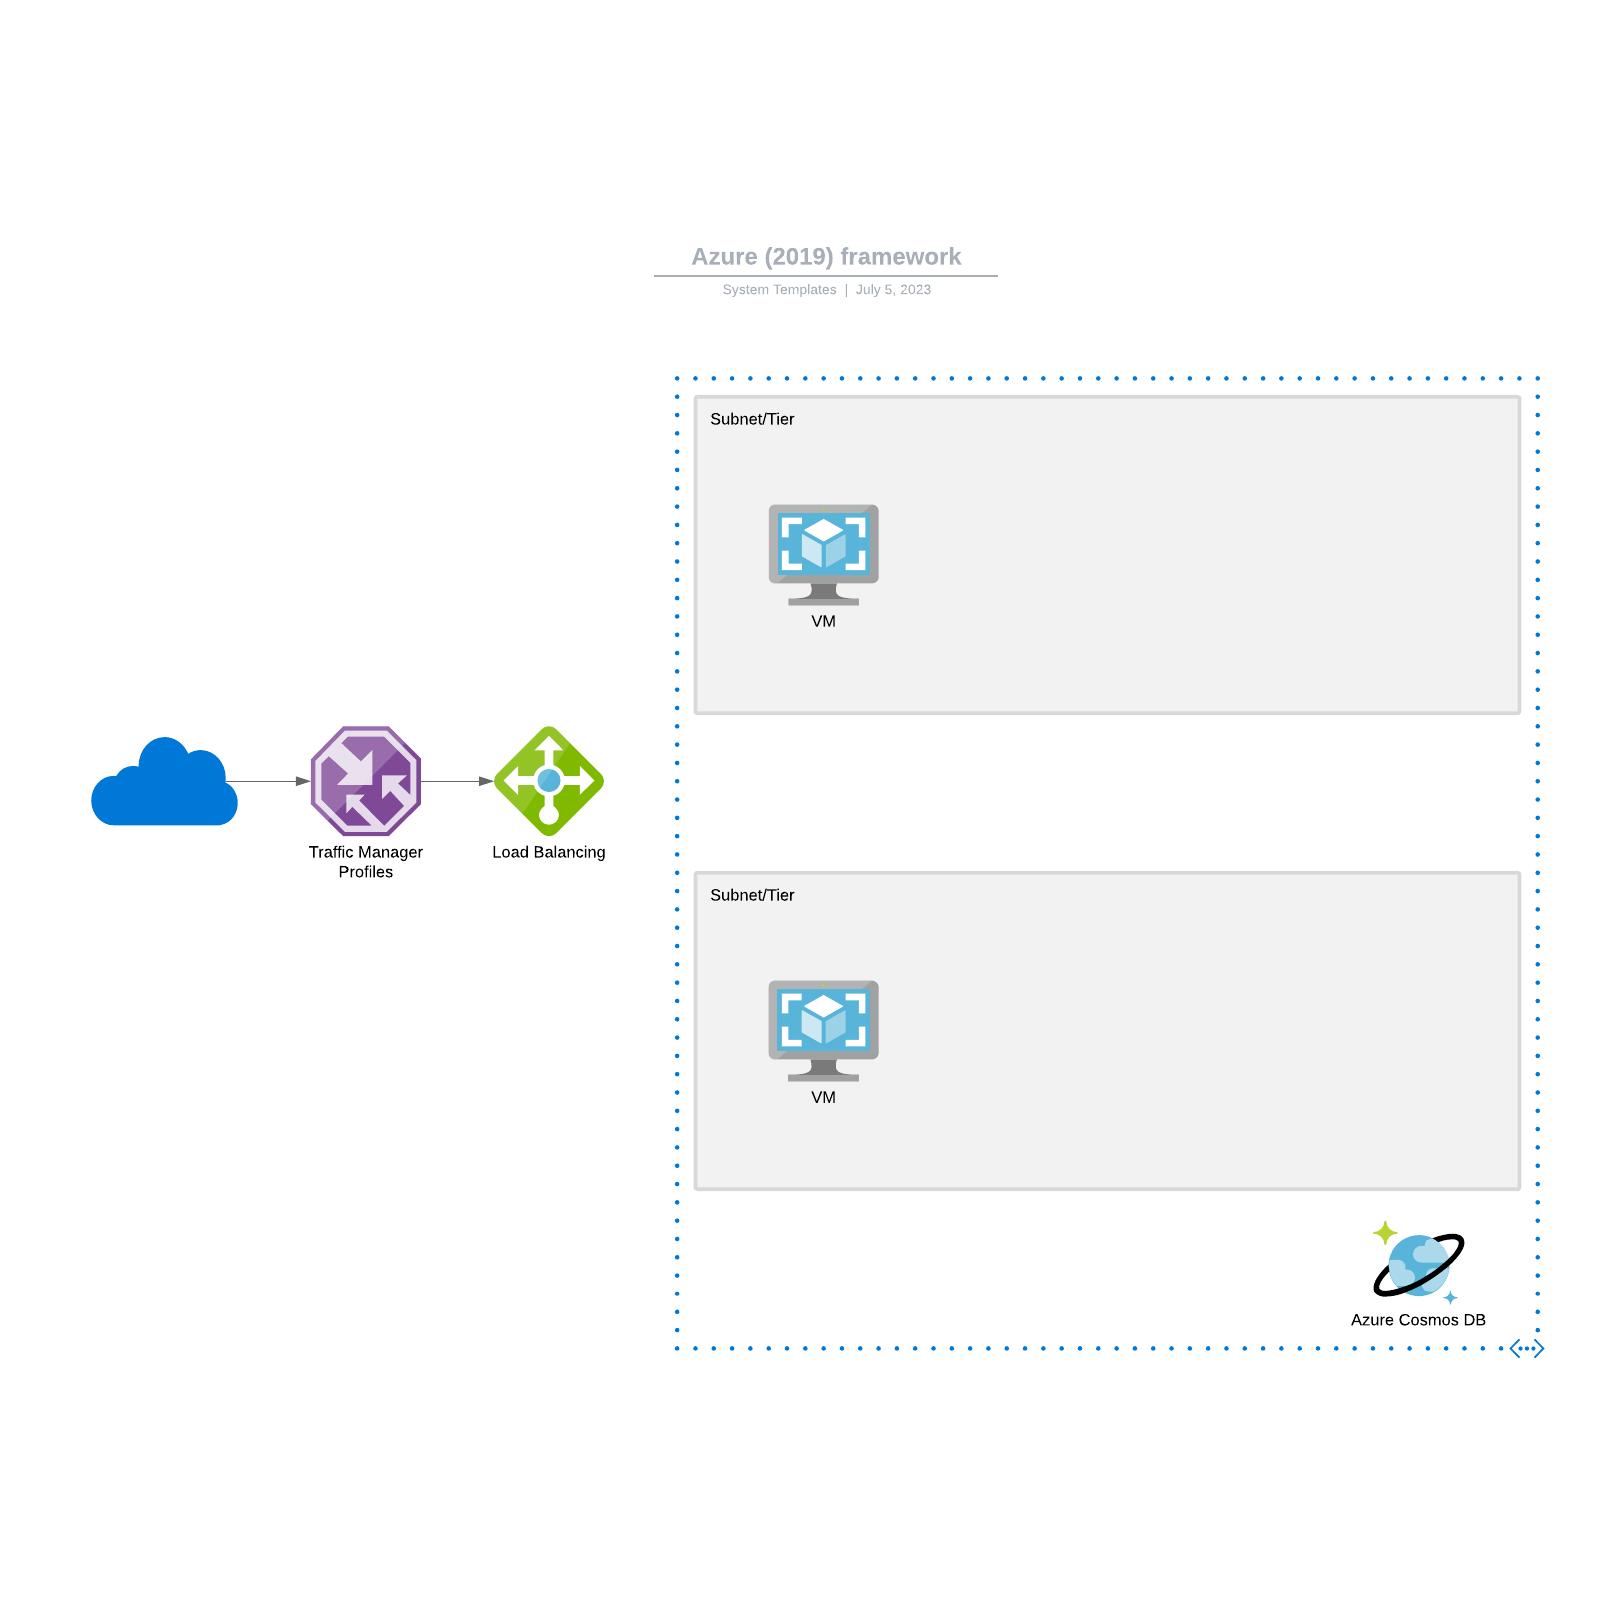 Azure (2019) framework